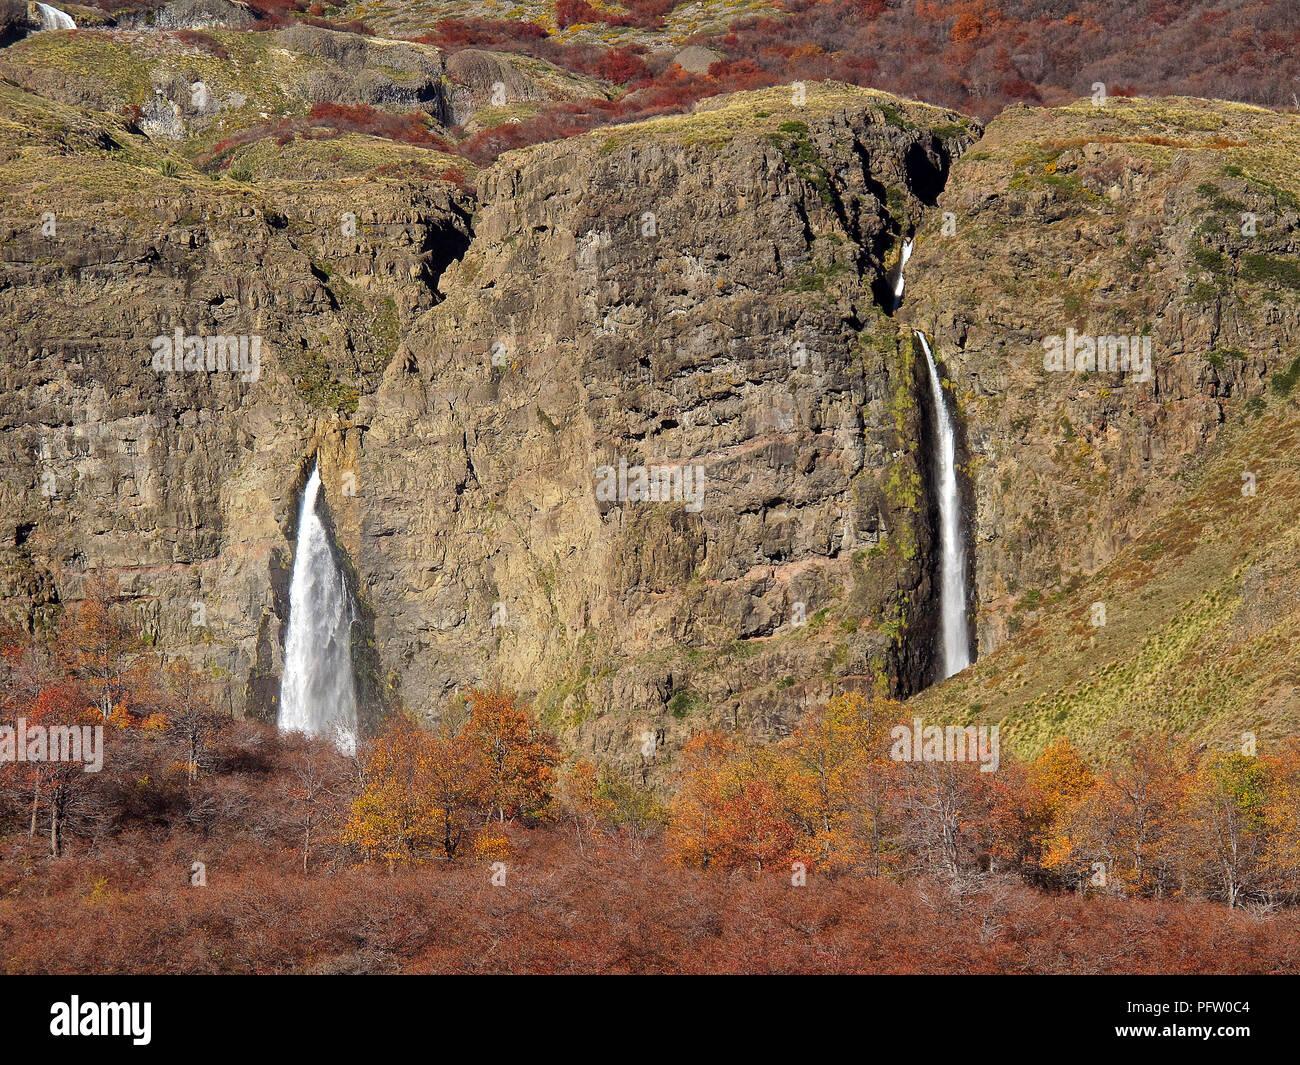 landscape in the Mapuche area - Stock Image